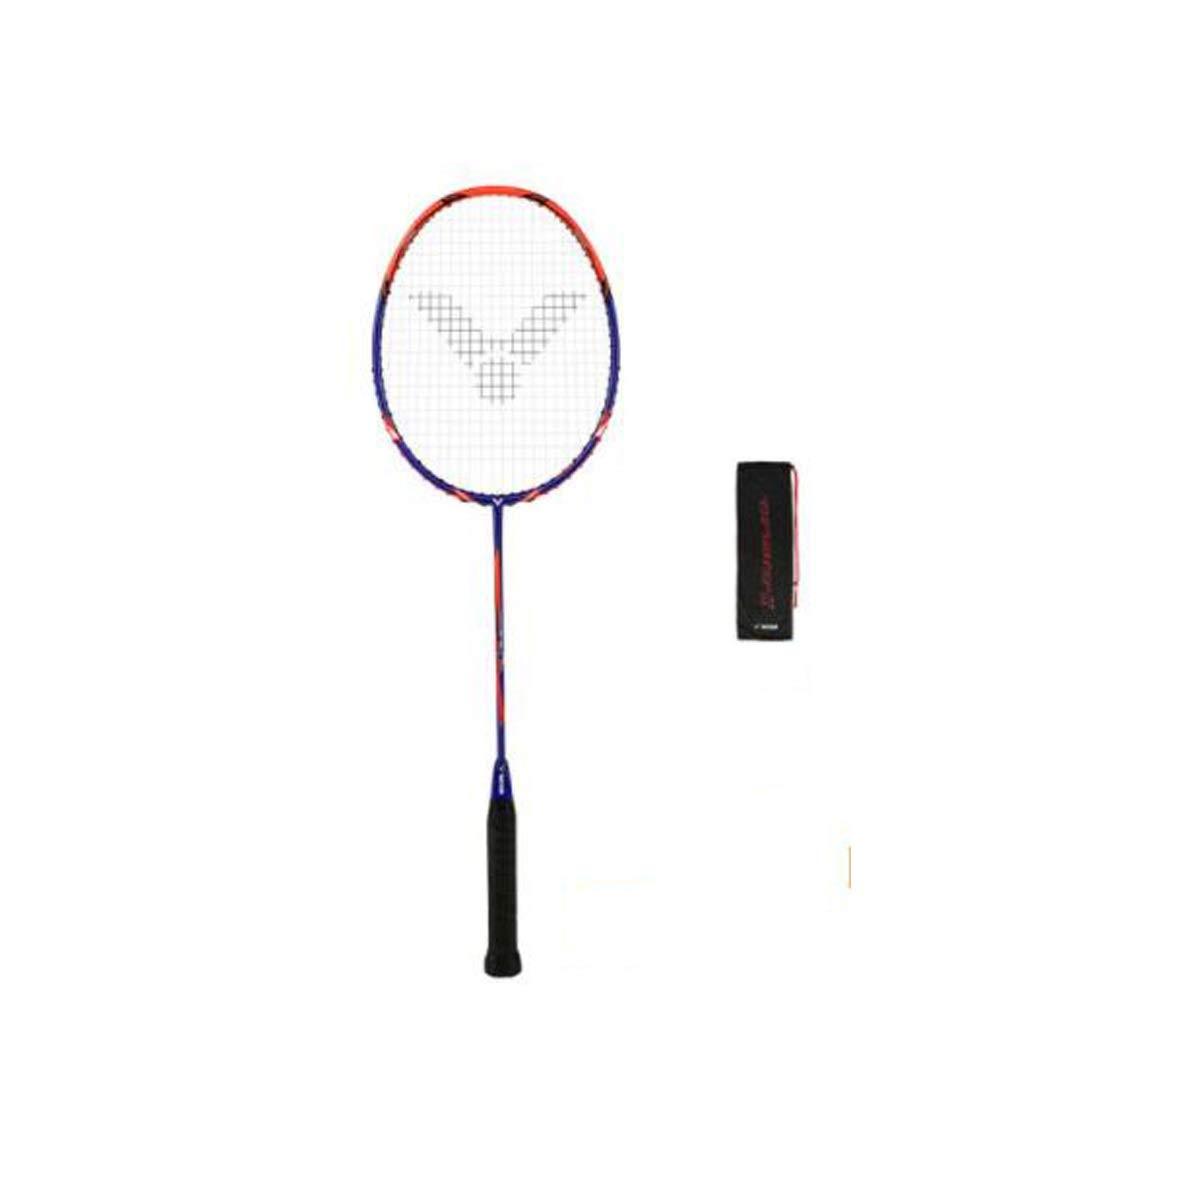 Tongboshi Badminton Racket, Training Level, Offensive, Carbon Fiber Badminton Racket, (deep Blue) Badminton Racket, (Color : Blue) by Tongboshi (Image #1)